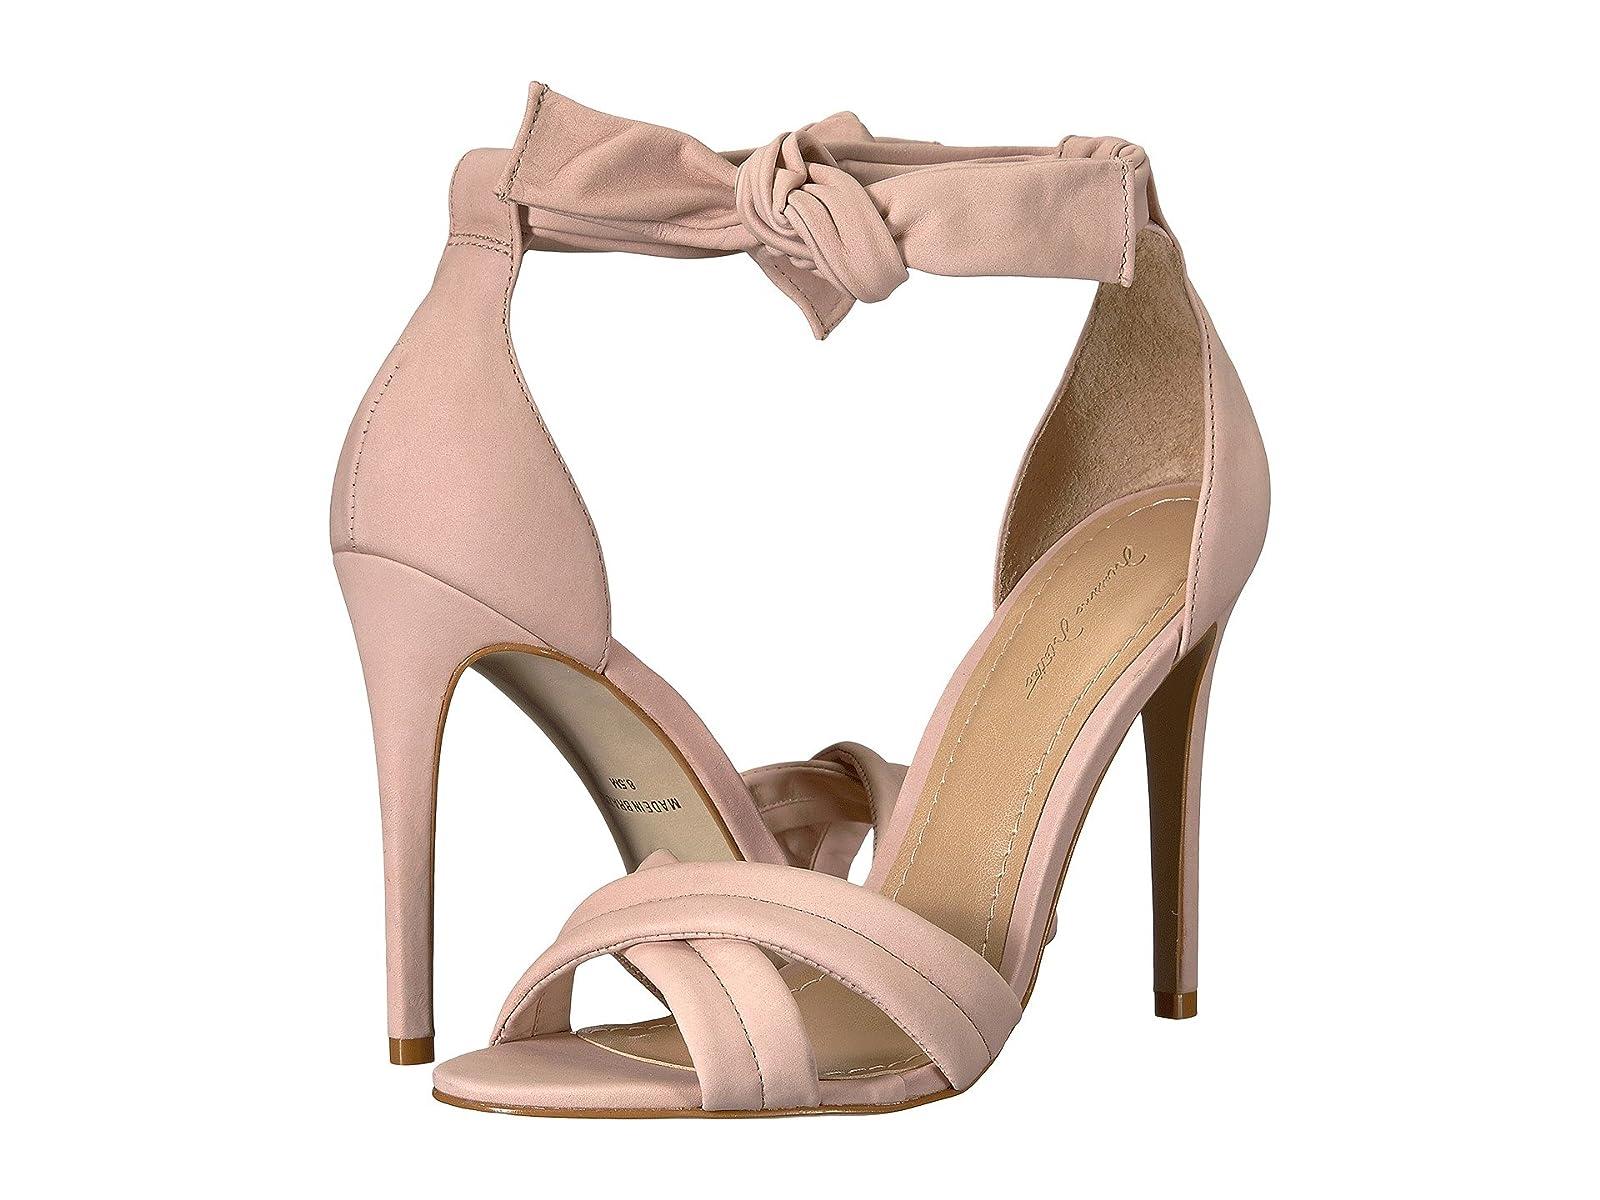 Massimo Matteo ResaAtmospheric grades have affordable shoes